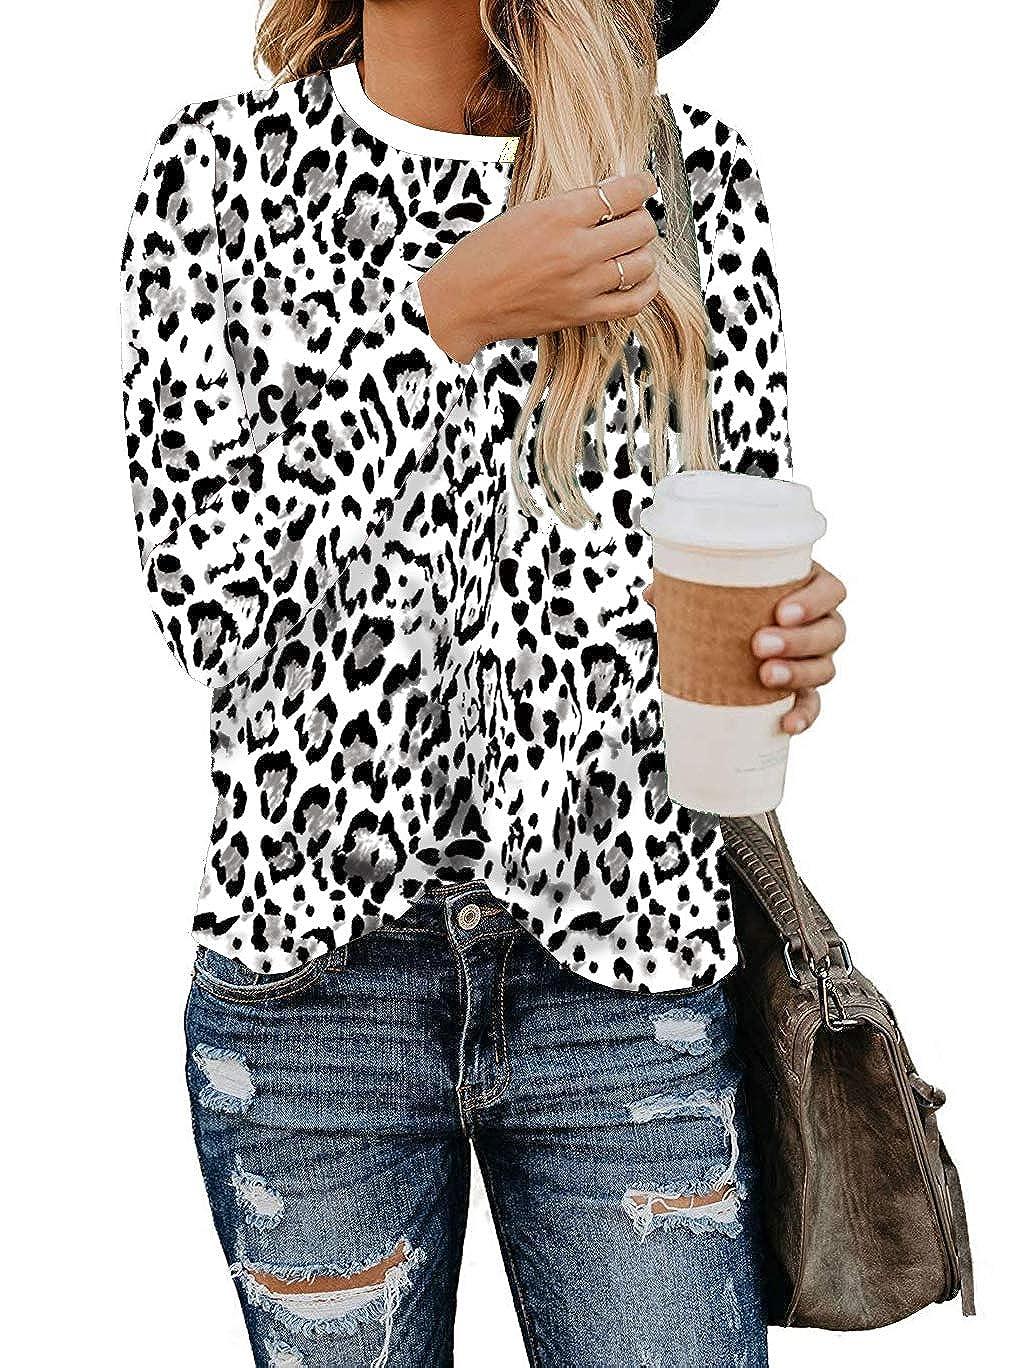 BTFBM Womens Leopard Print Long Sleeve Crew Neck Fit Casual Sweatshirt Pullover Tops Shirts